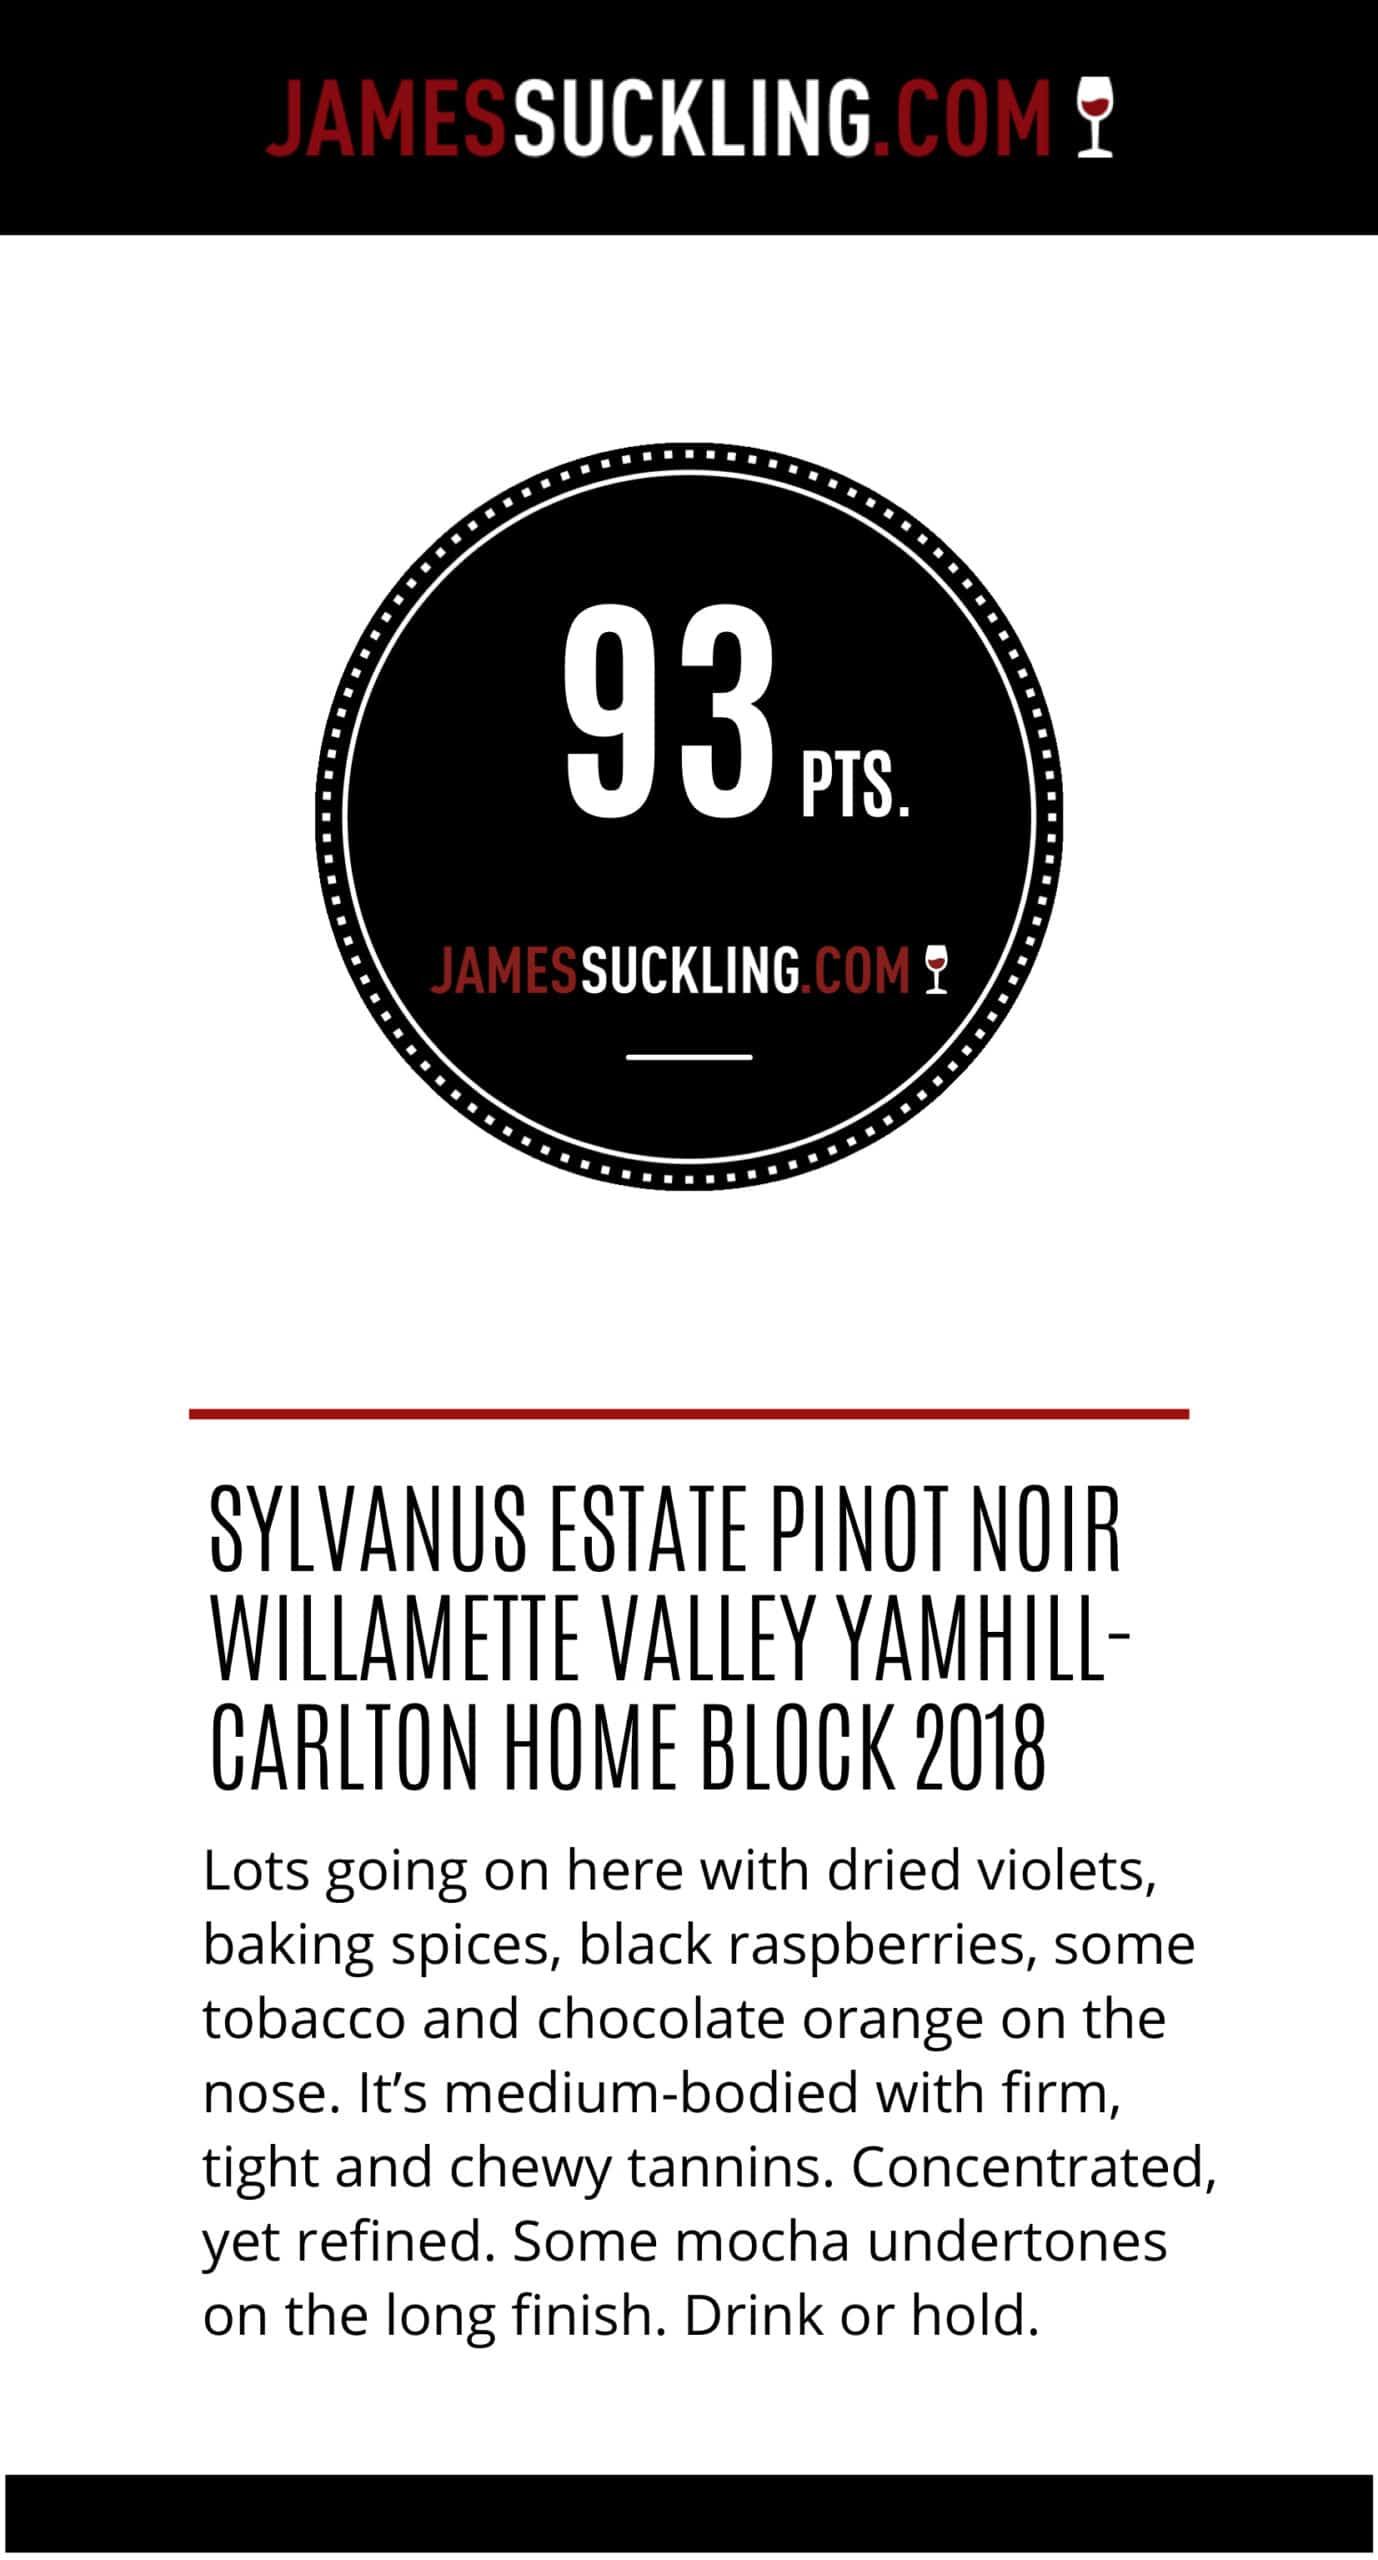 sylvanus_estate_pinot_noir_willamette_valley_yamhill-carlton_home_block_2018